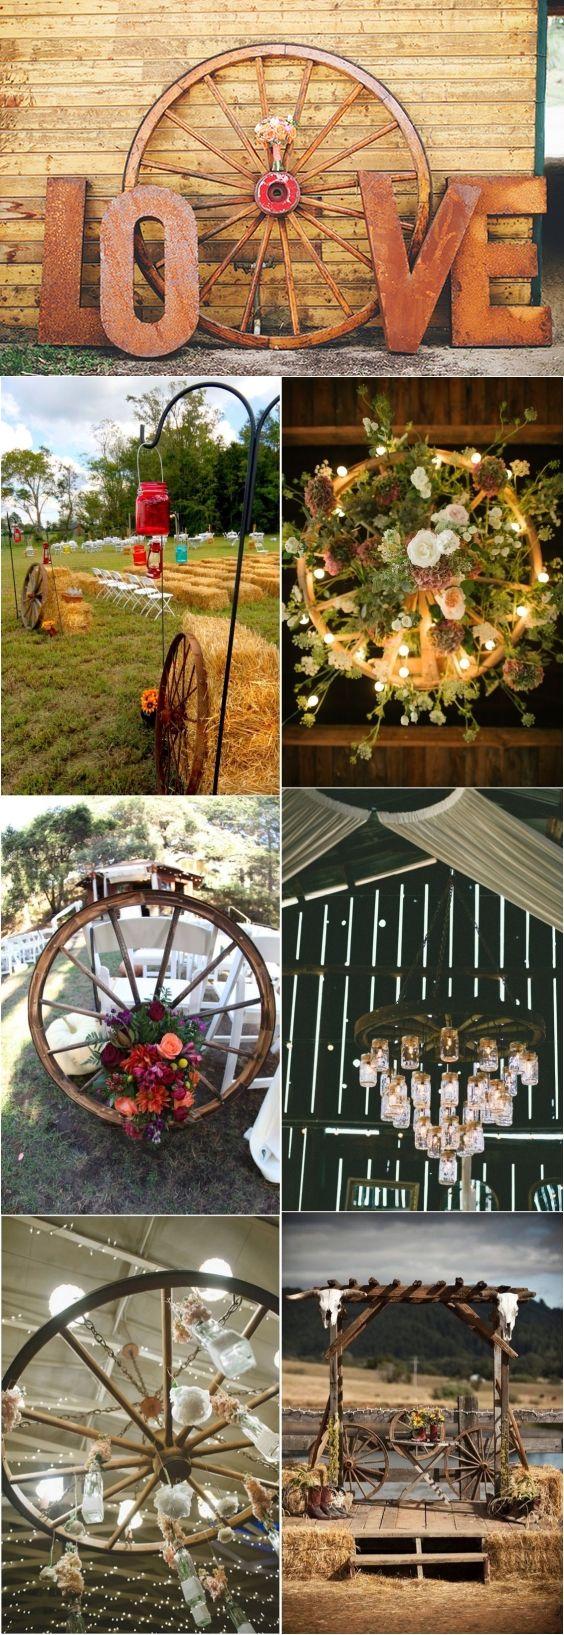 rustic country wedding ideas with wagon wheel details wedding